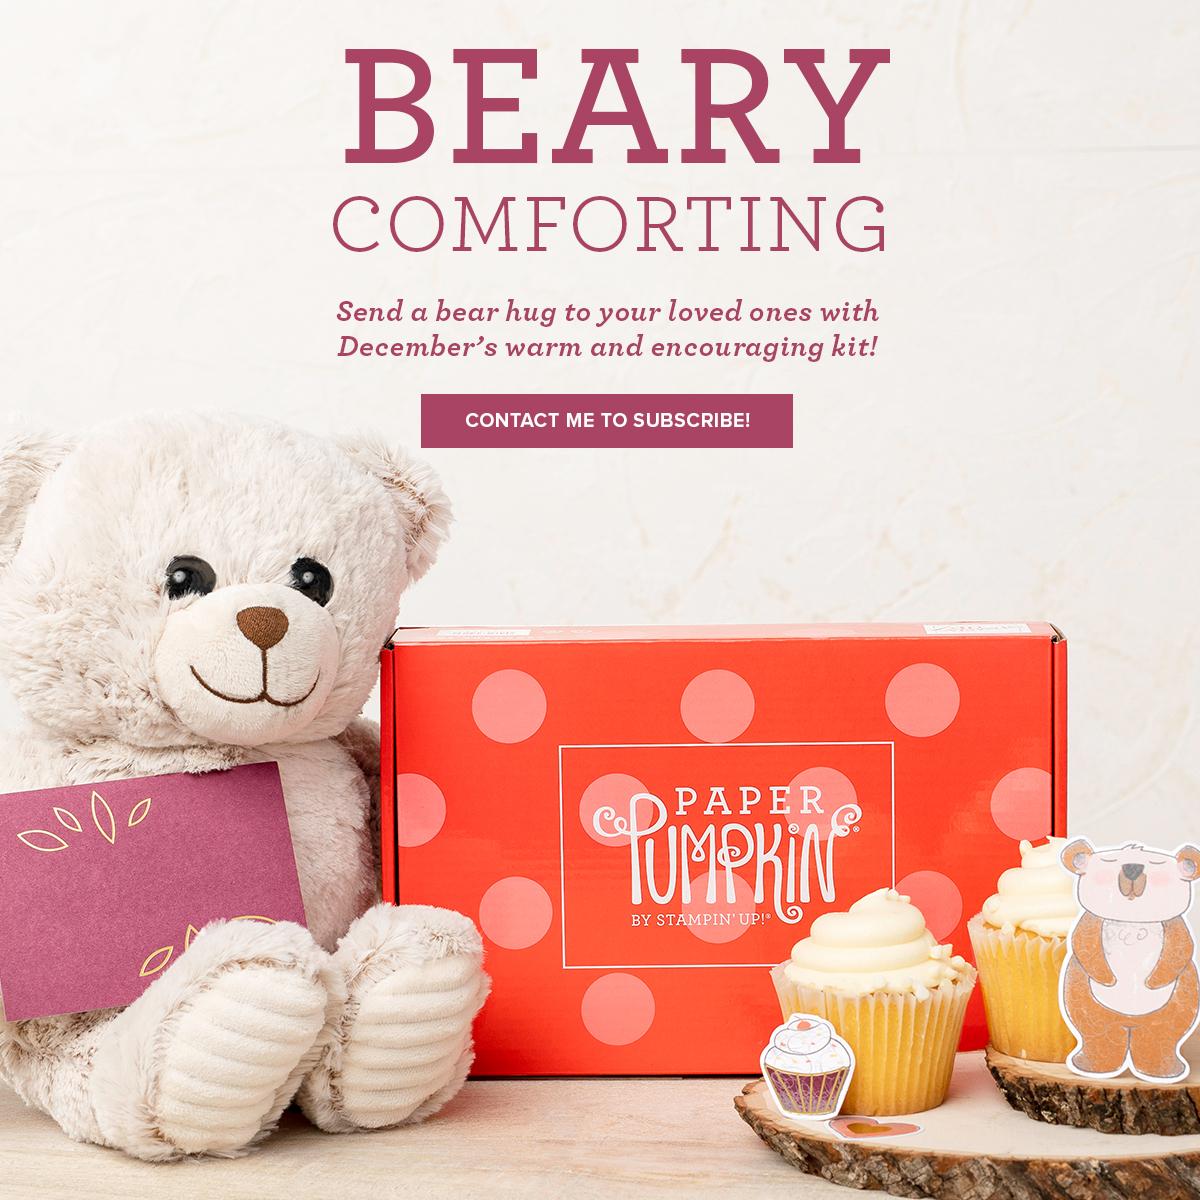 Bearing Comforting Paper Pumpkin Kit